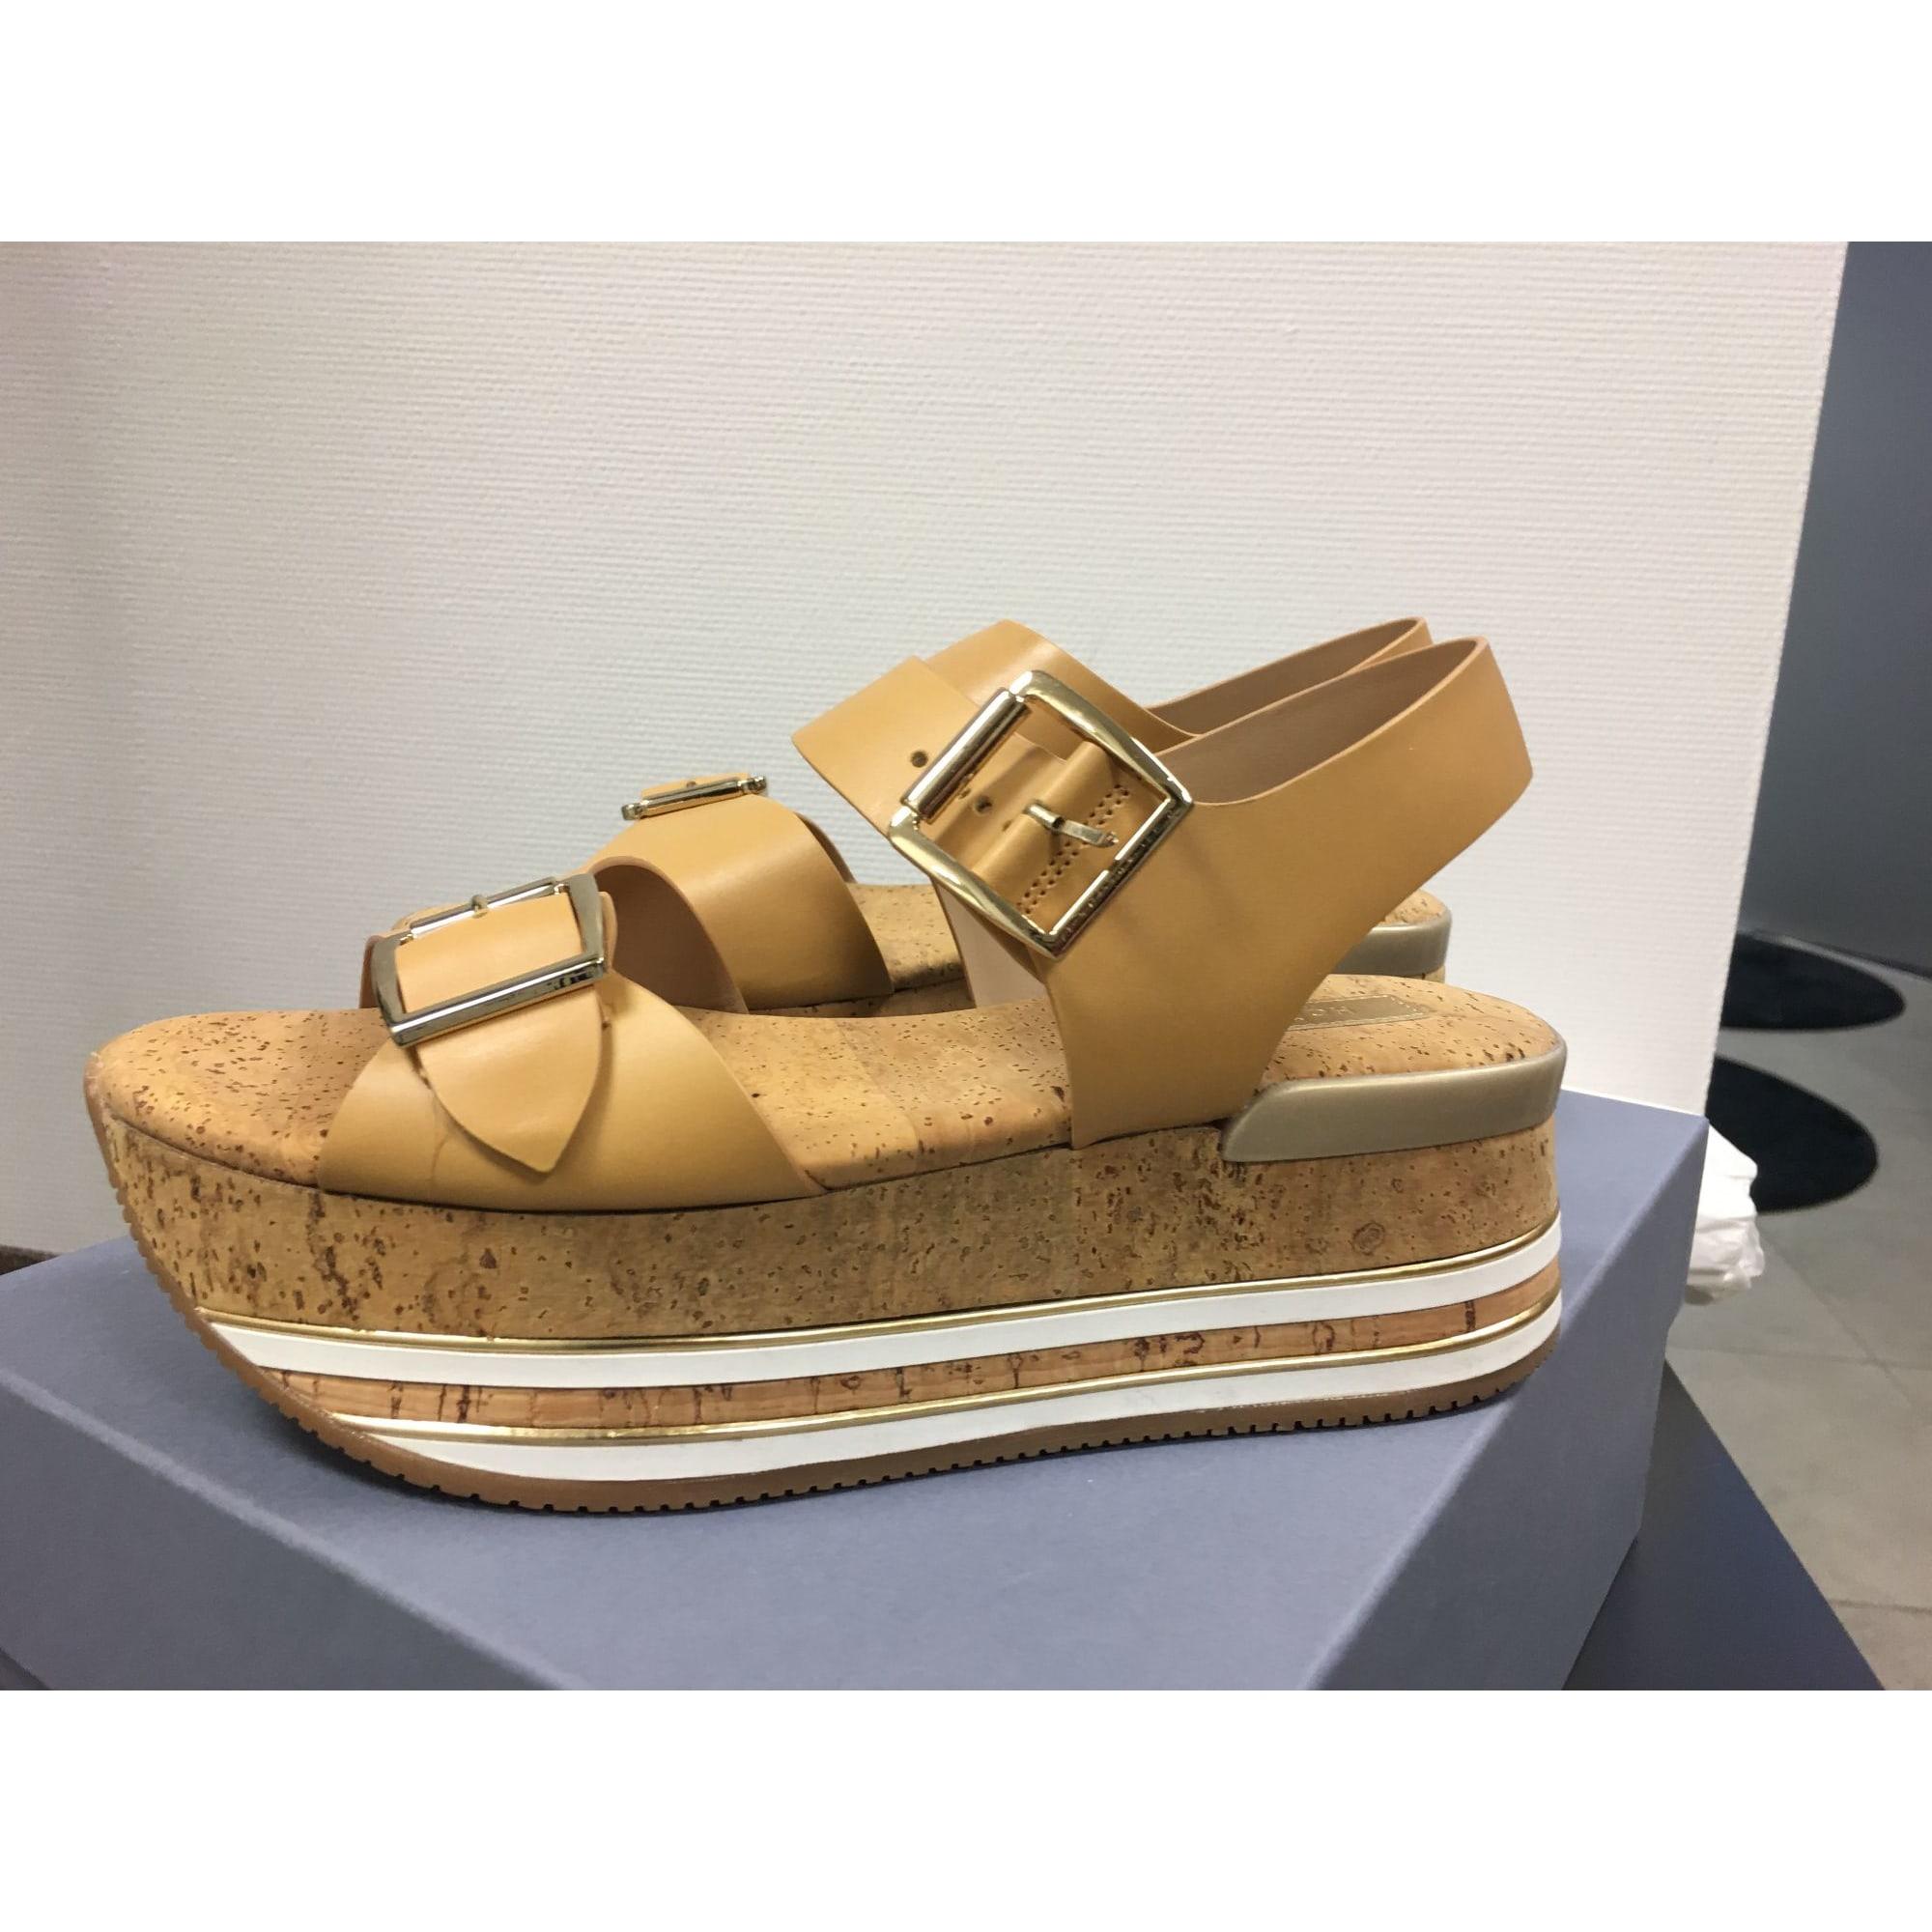 Sandales compensées HOGAN Beige, camel